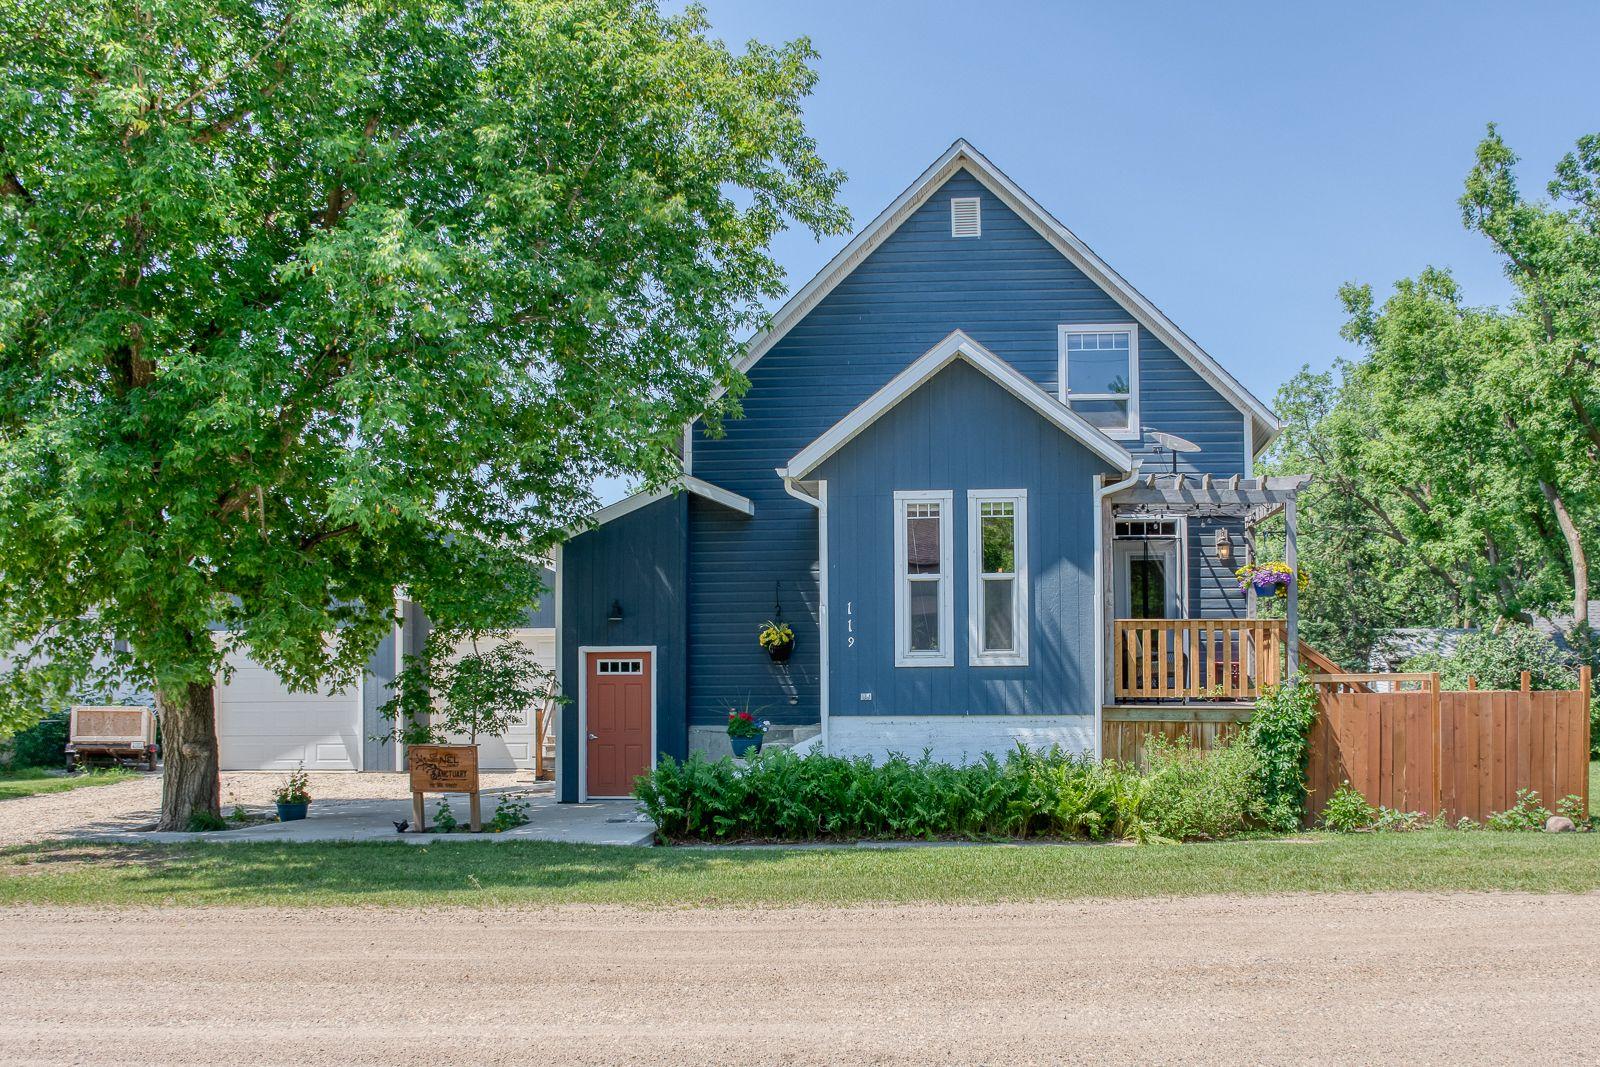 Main Photo: 119 3rd Street in Lavenham: House for sale : MLS®# 202116528